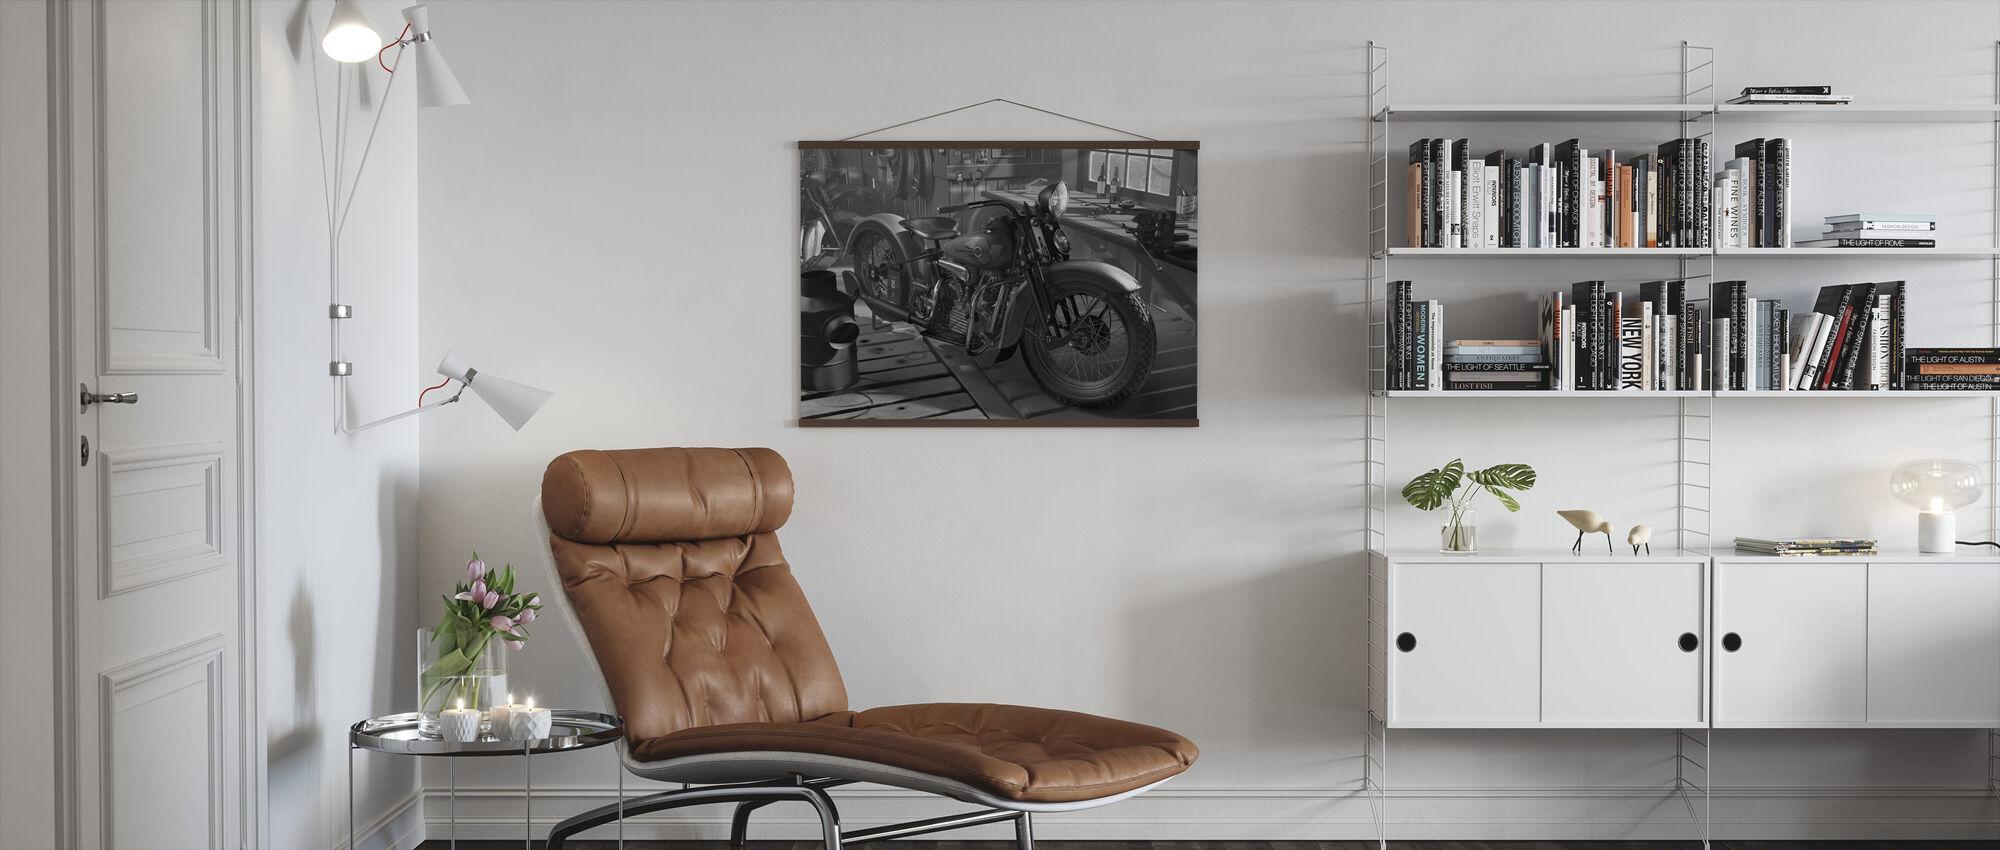 Old Barn BW - Poster - Living Room